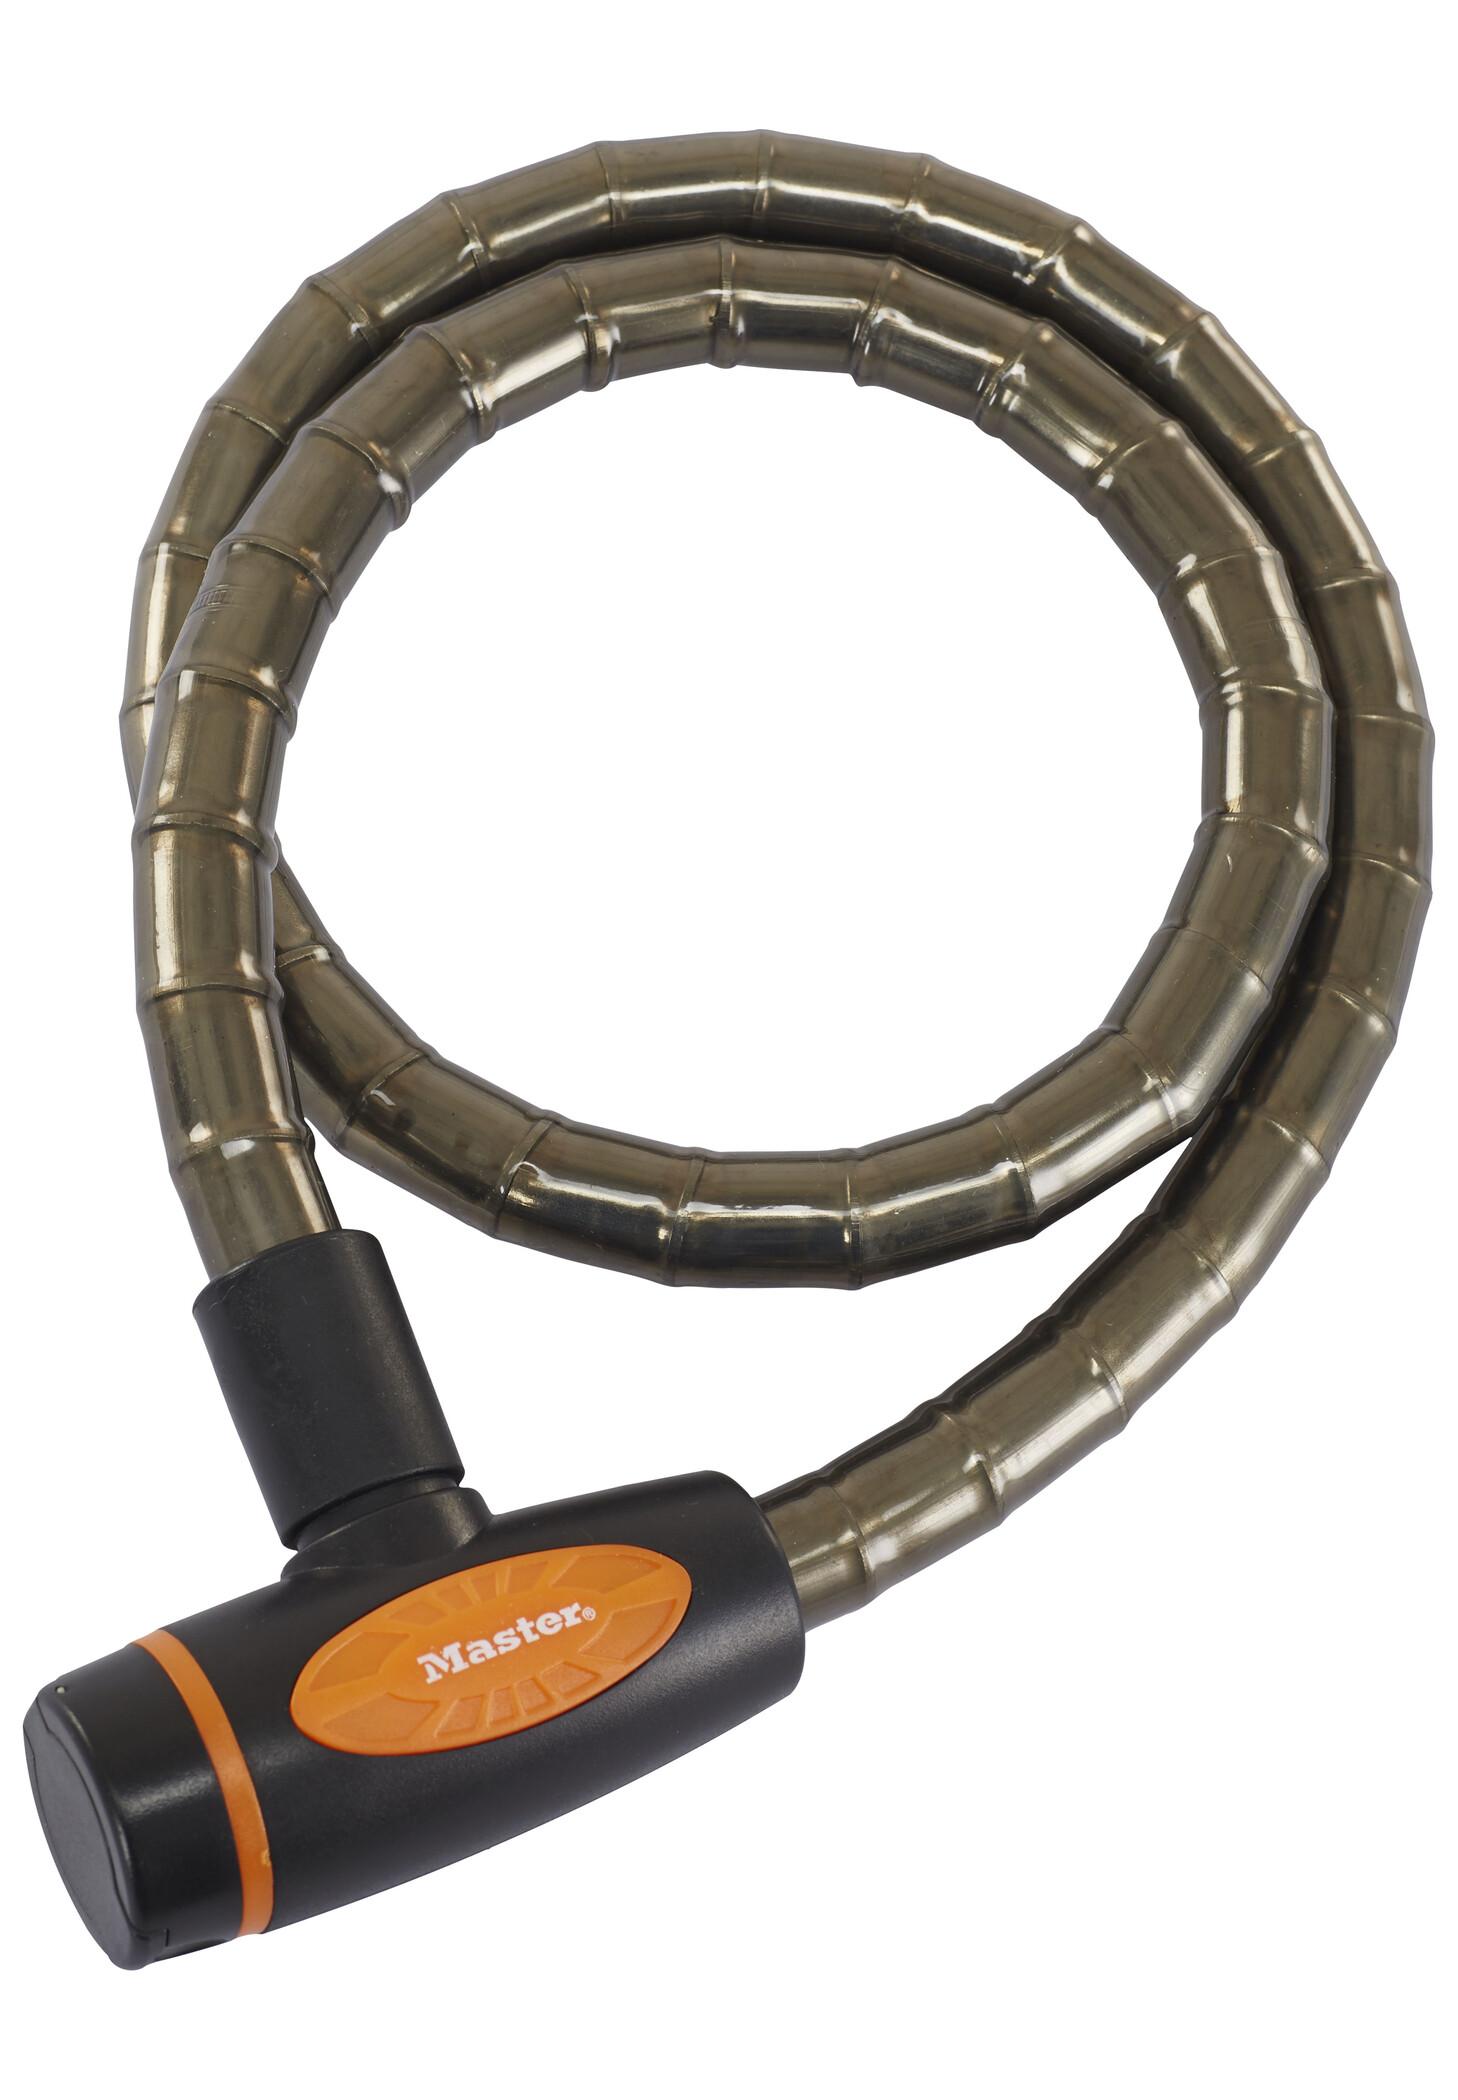 Masterlock 8228 PanzR Cable Lock 18 mm x 1.000 mm, deep grey (2019)   Løse låse